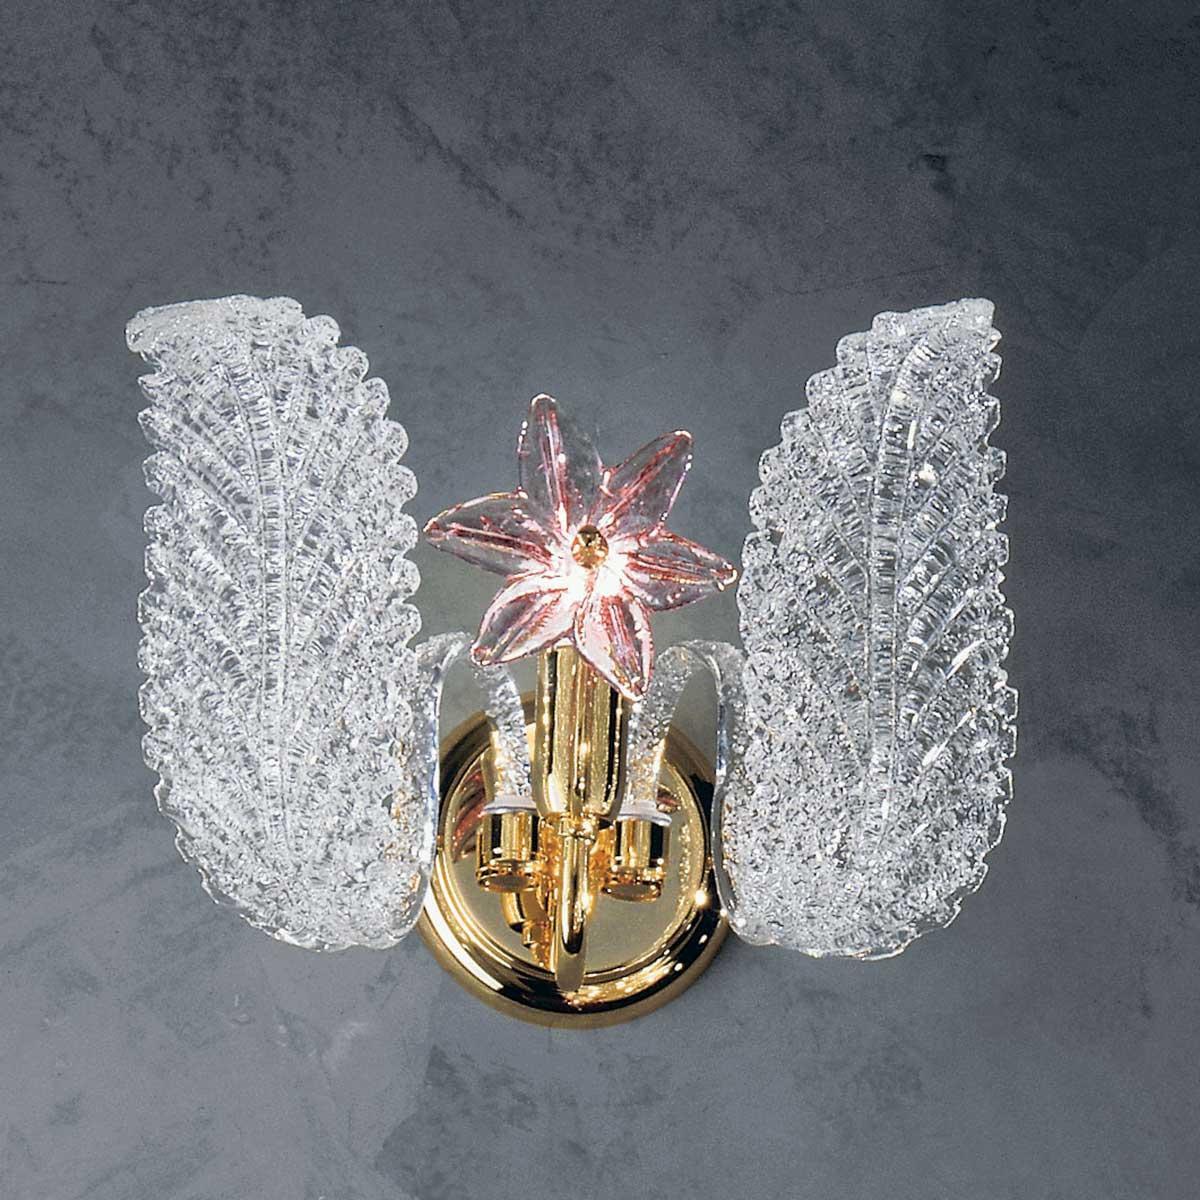 """Fiordaliso"" Murano glas wandleuchte - 1 flammig - transparent und rosa"